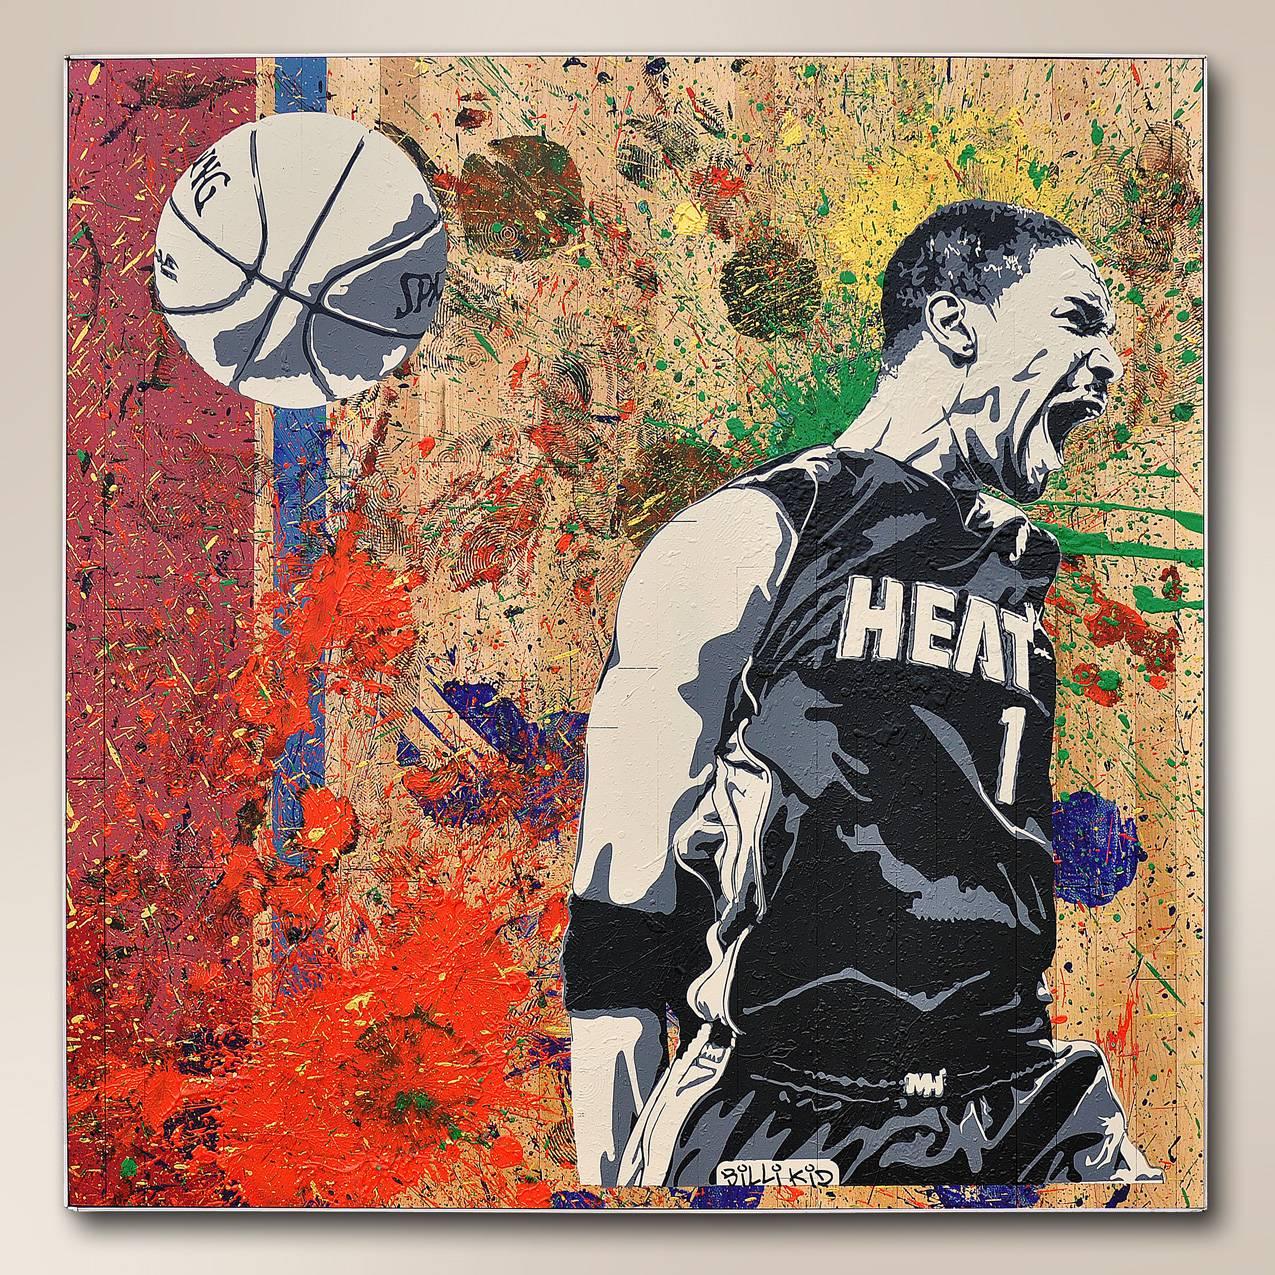 ArtOfBasketball-Bosh2012